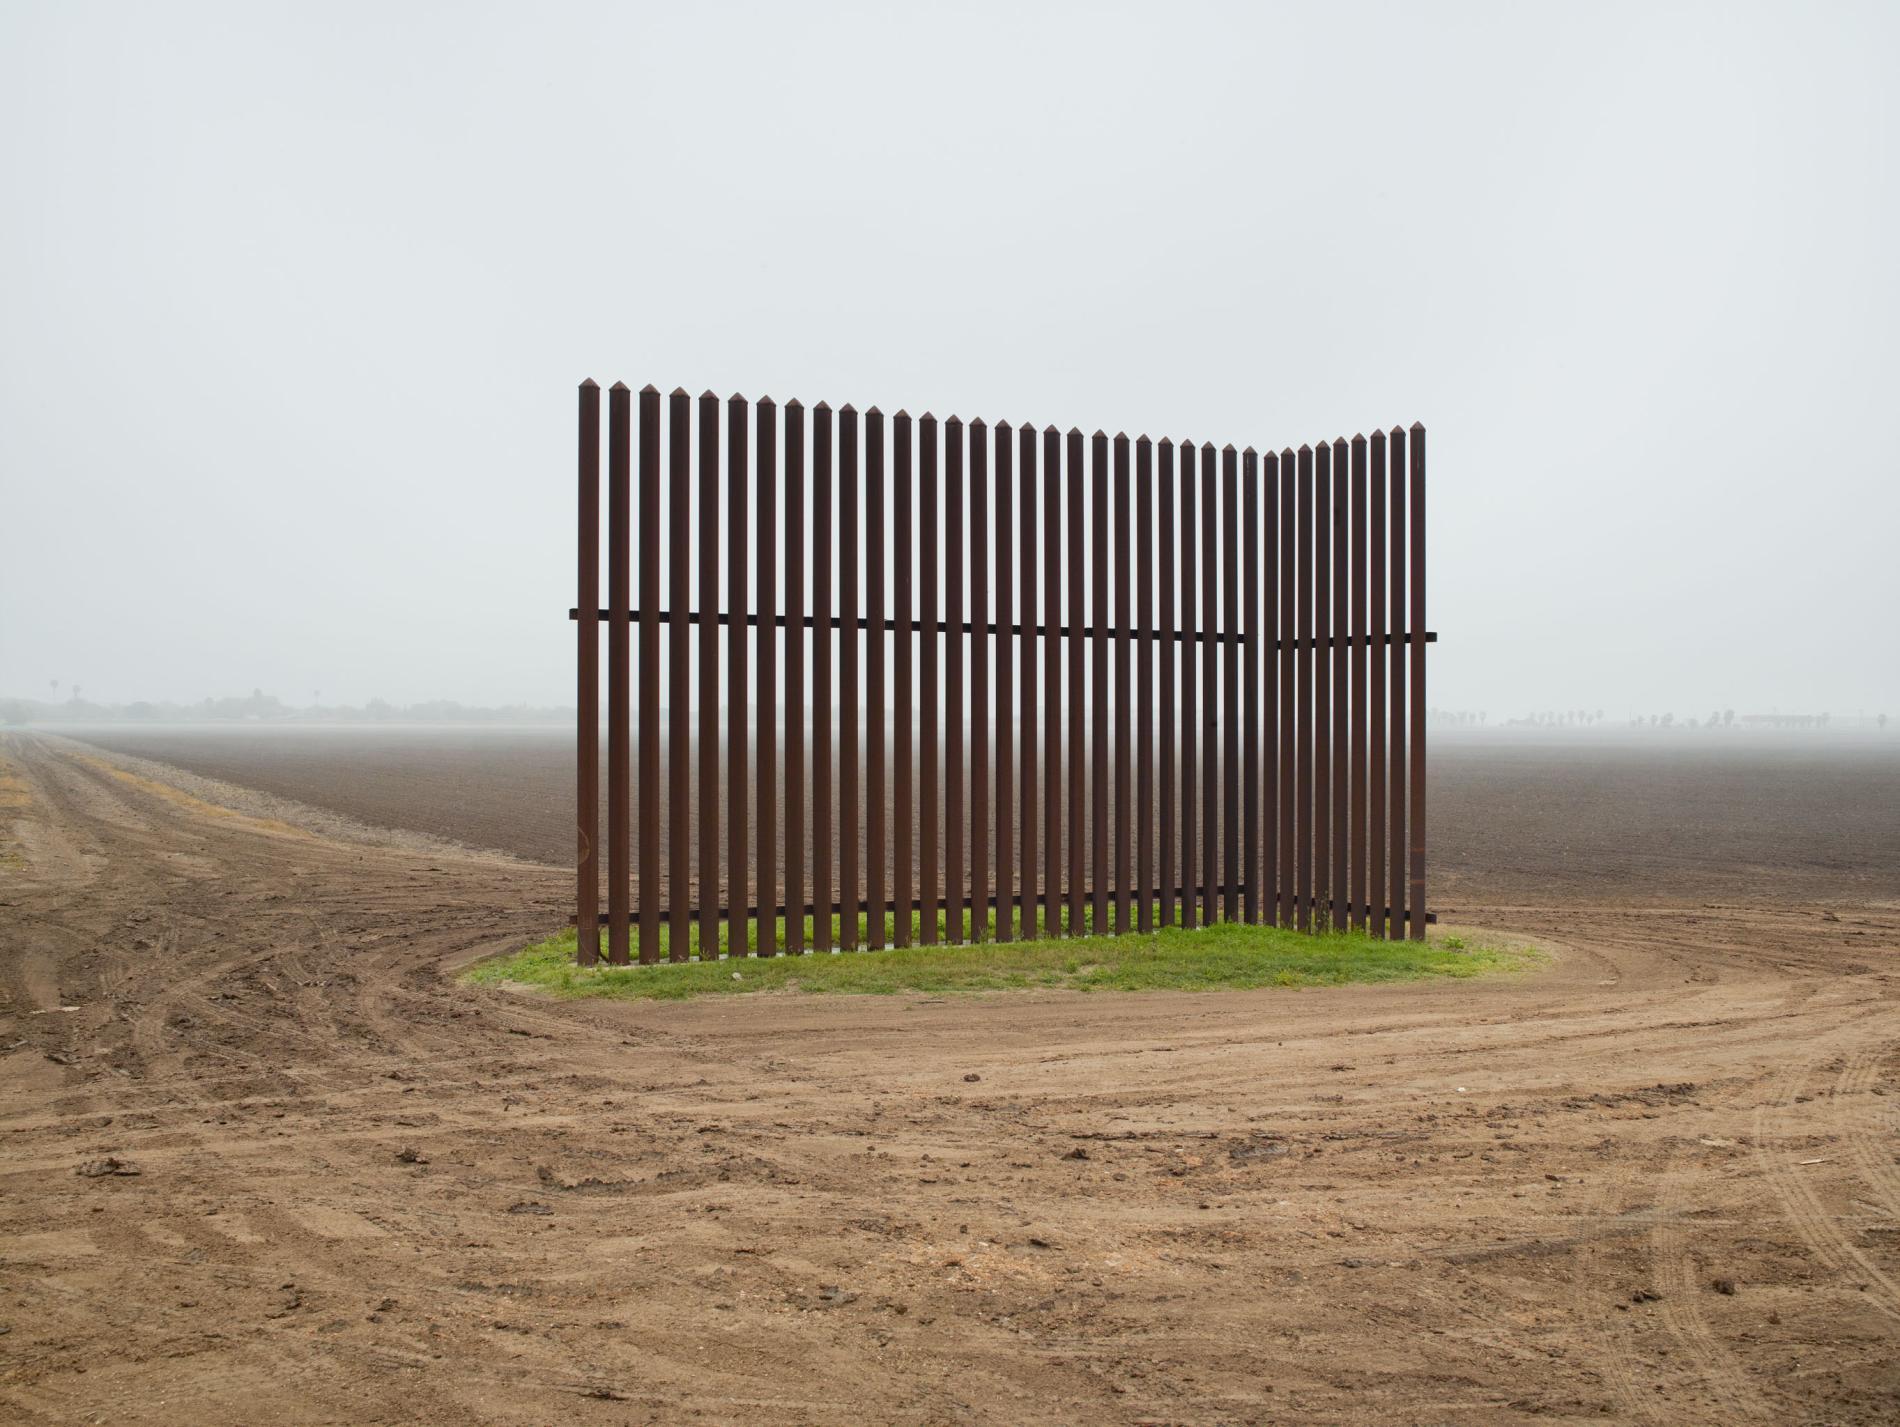 border-wall-los-indios.adapt.1900.1.jpg